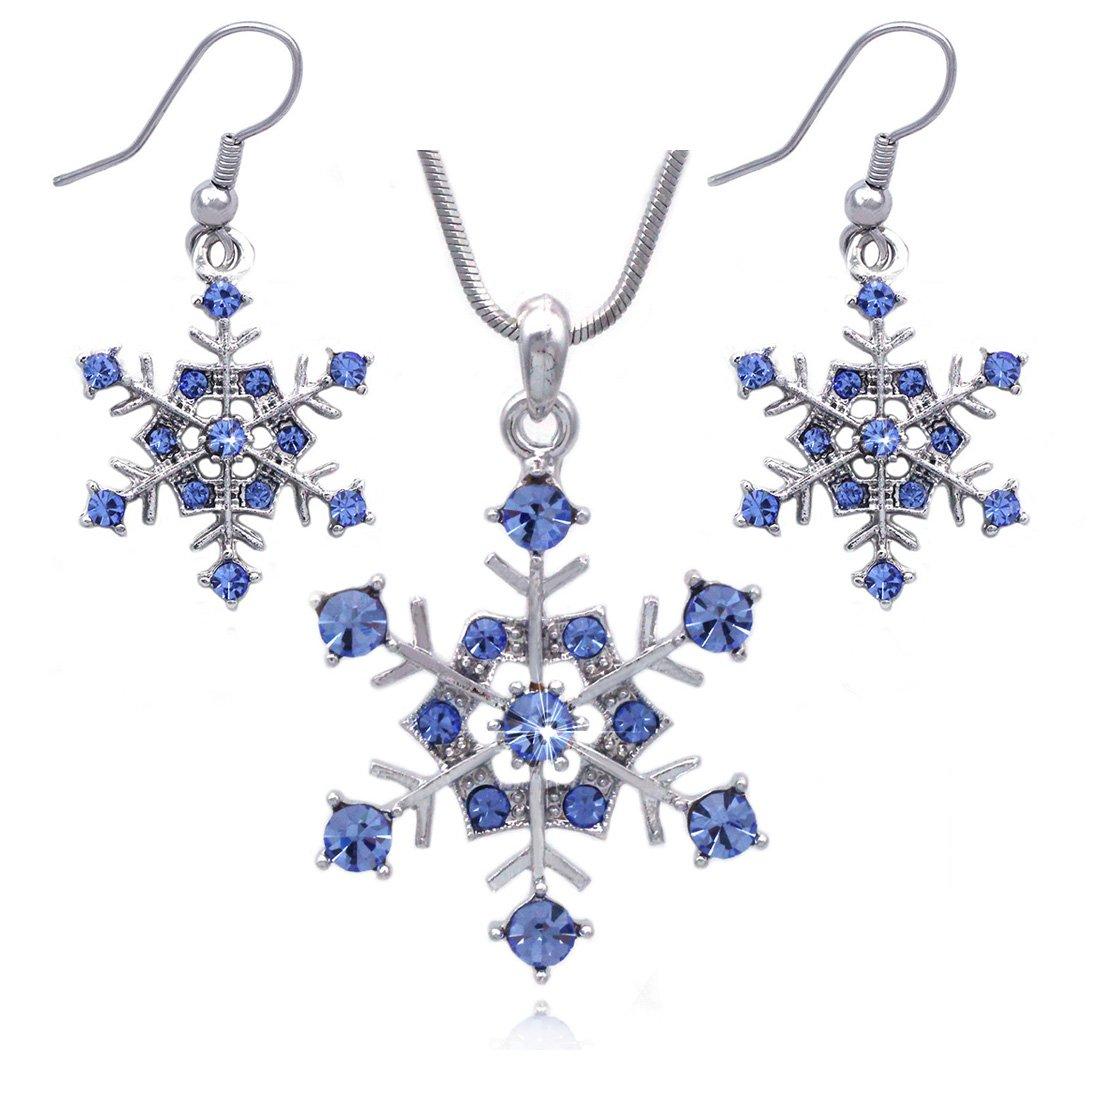 Winter Snow Snowflake Wedding Bridesmaid Pendant Necklace Earrings Jewelry Set (Blue)